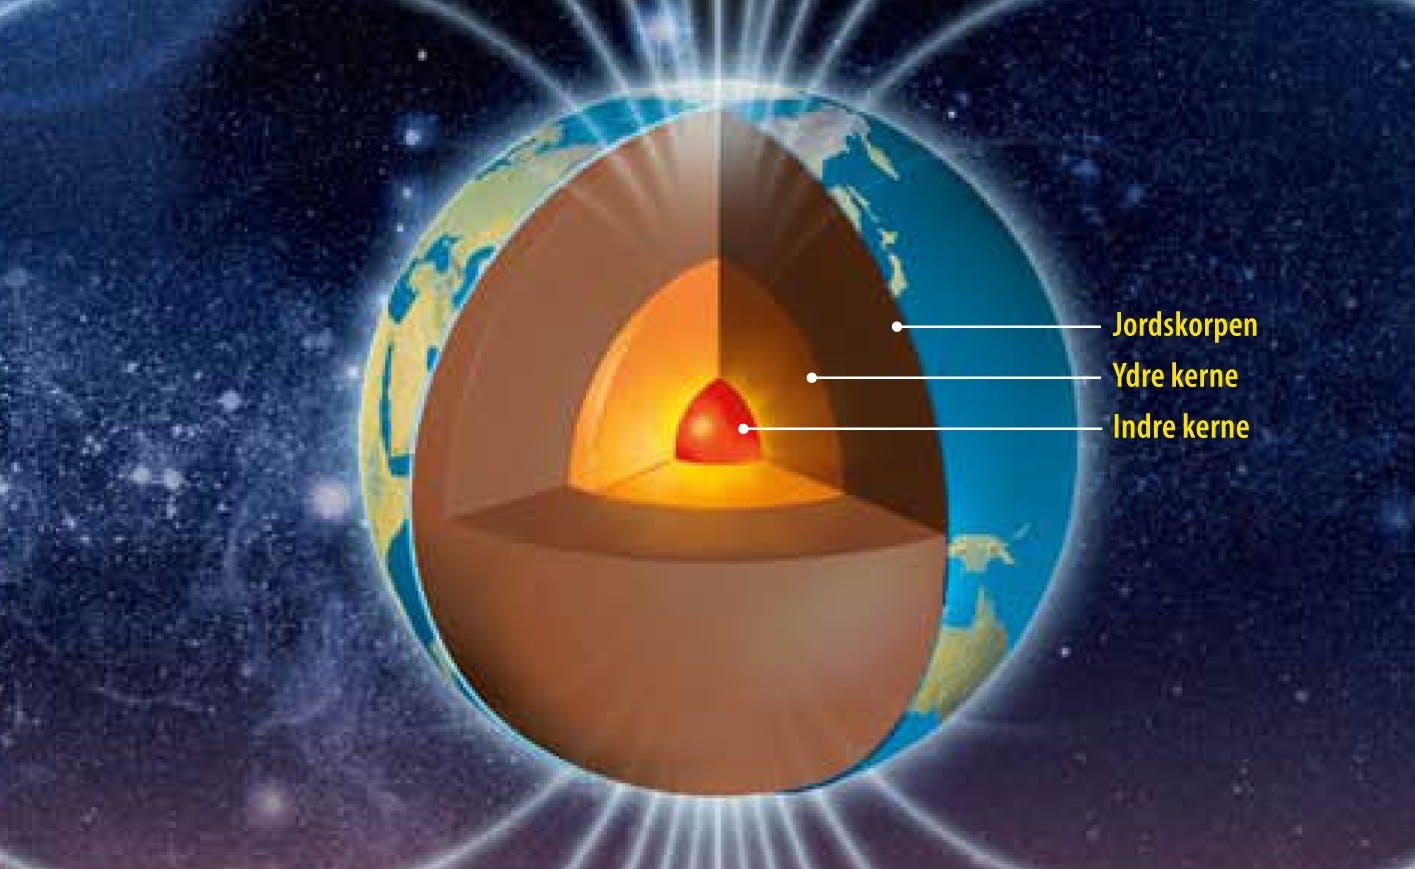 Magnetic earth DK